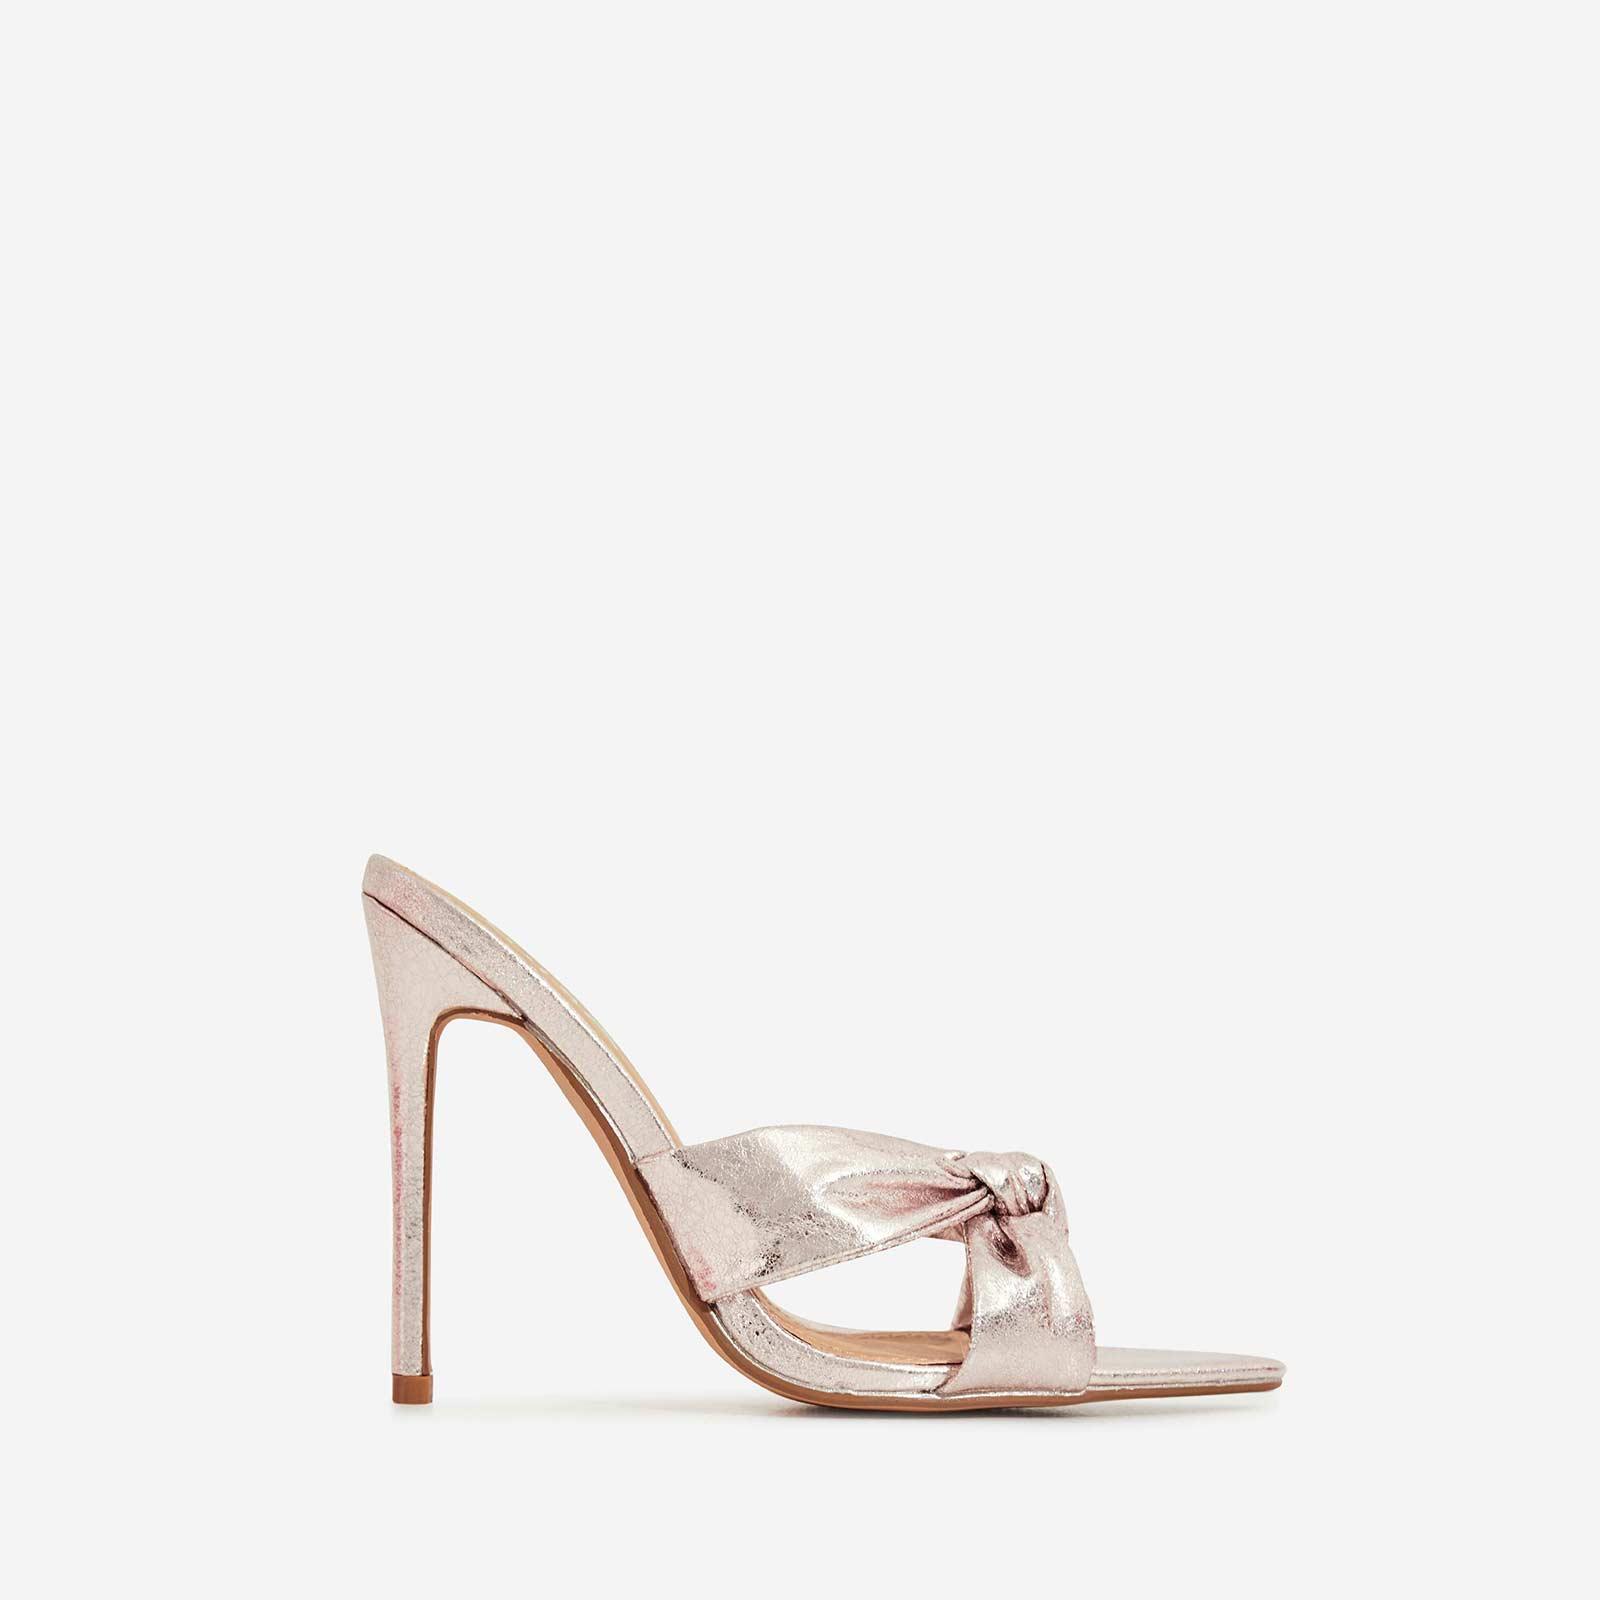 Saska Knot Detail Pointed Peep Toe Heel Mule In Rose Gold Faux Leather